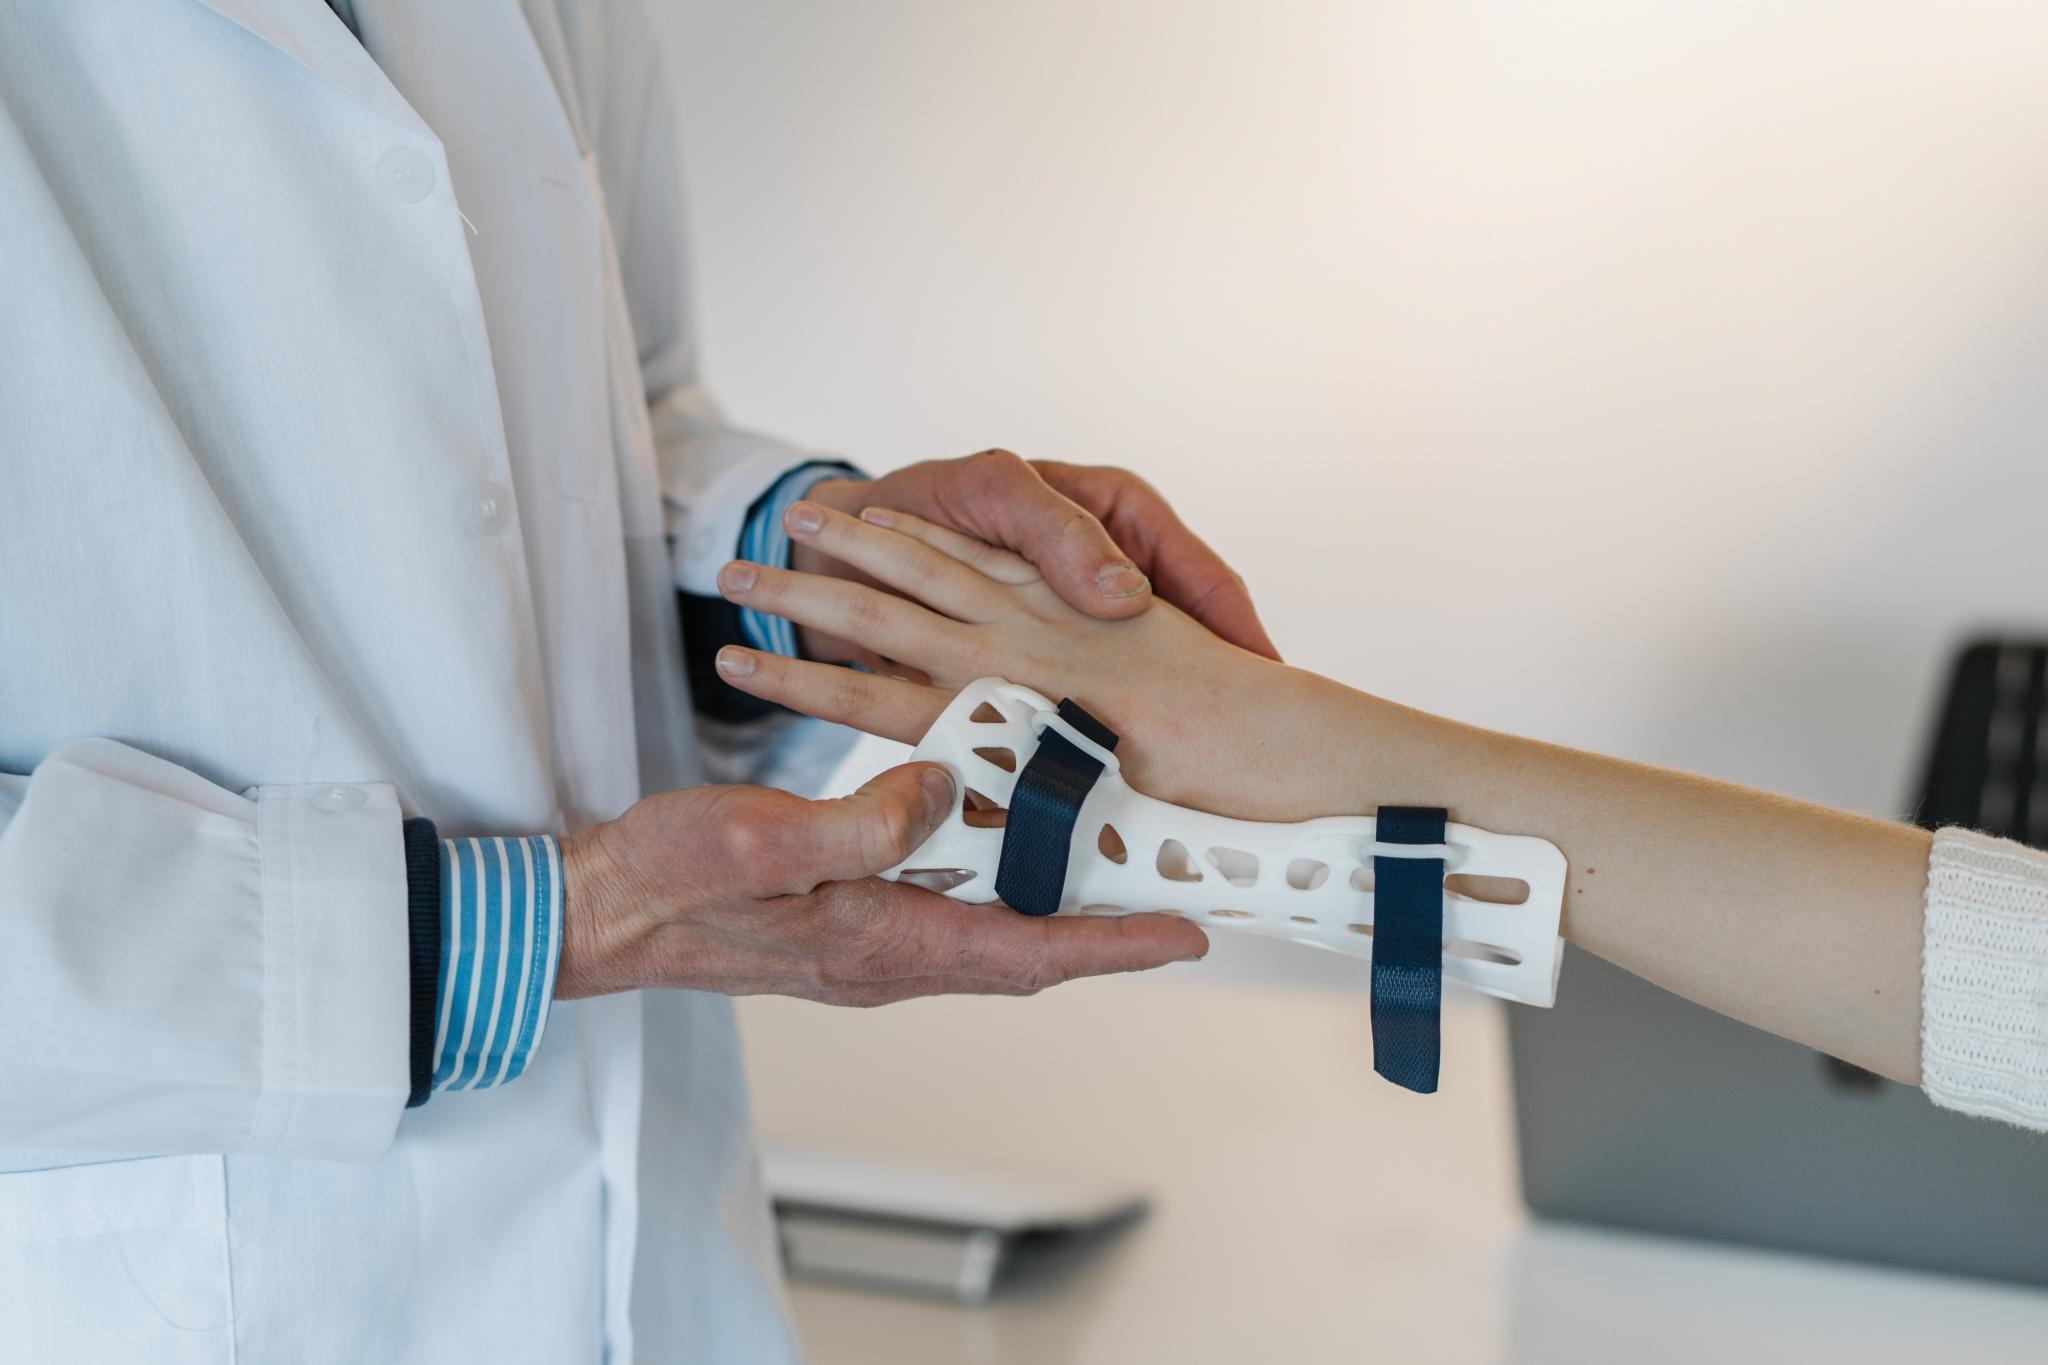 Medical professional applying a splint